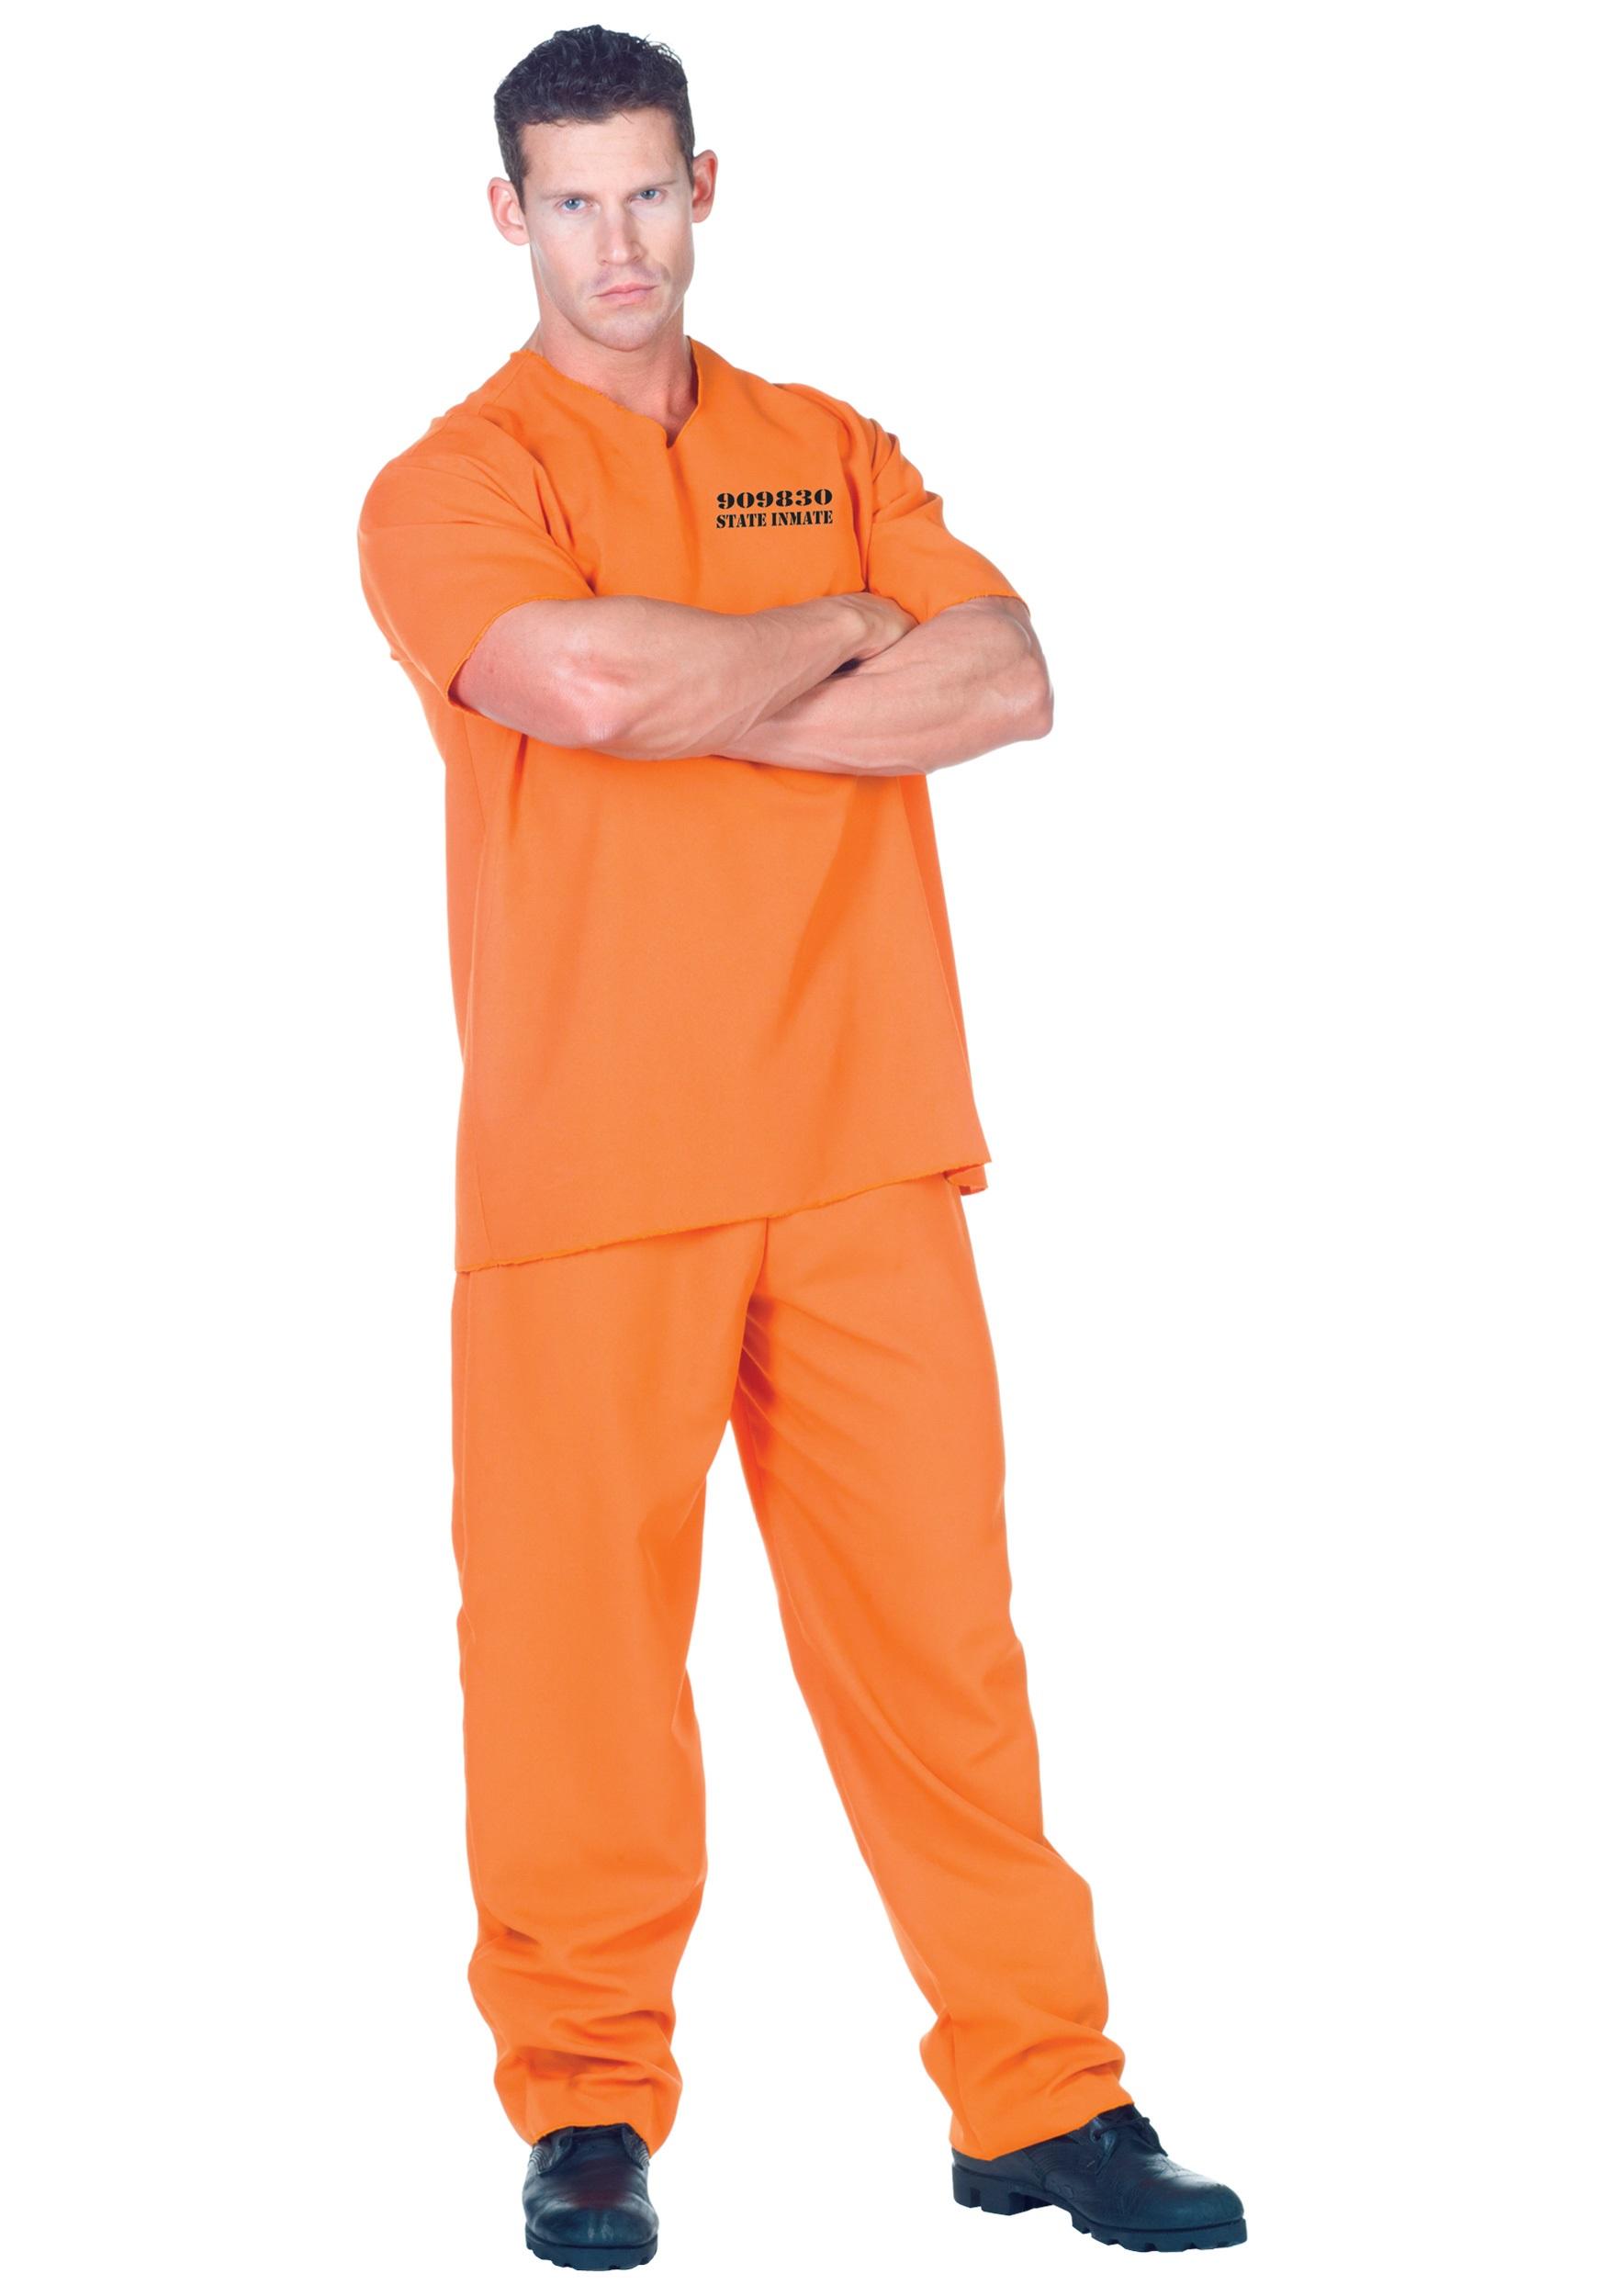 Plus Public Offender Inmate Costume  sc 1 st  Halloween Costumes & Plus Public Offender Inmate Costume 2X 4X